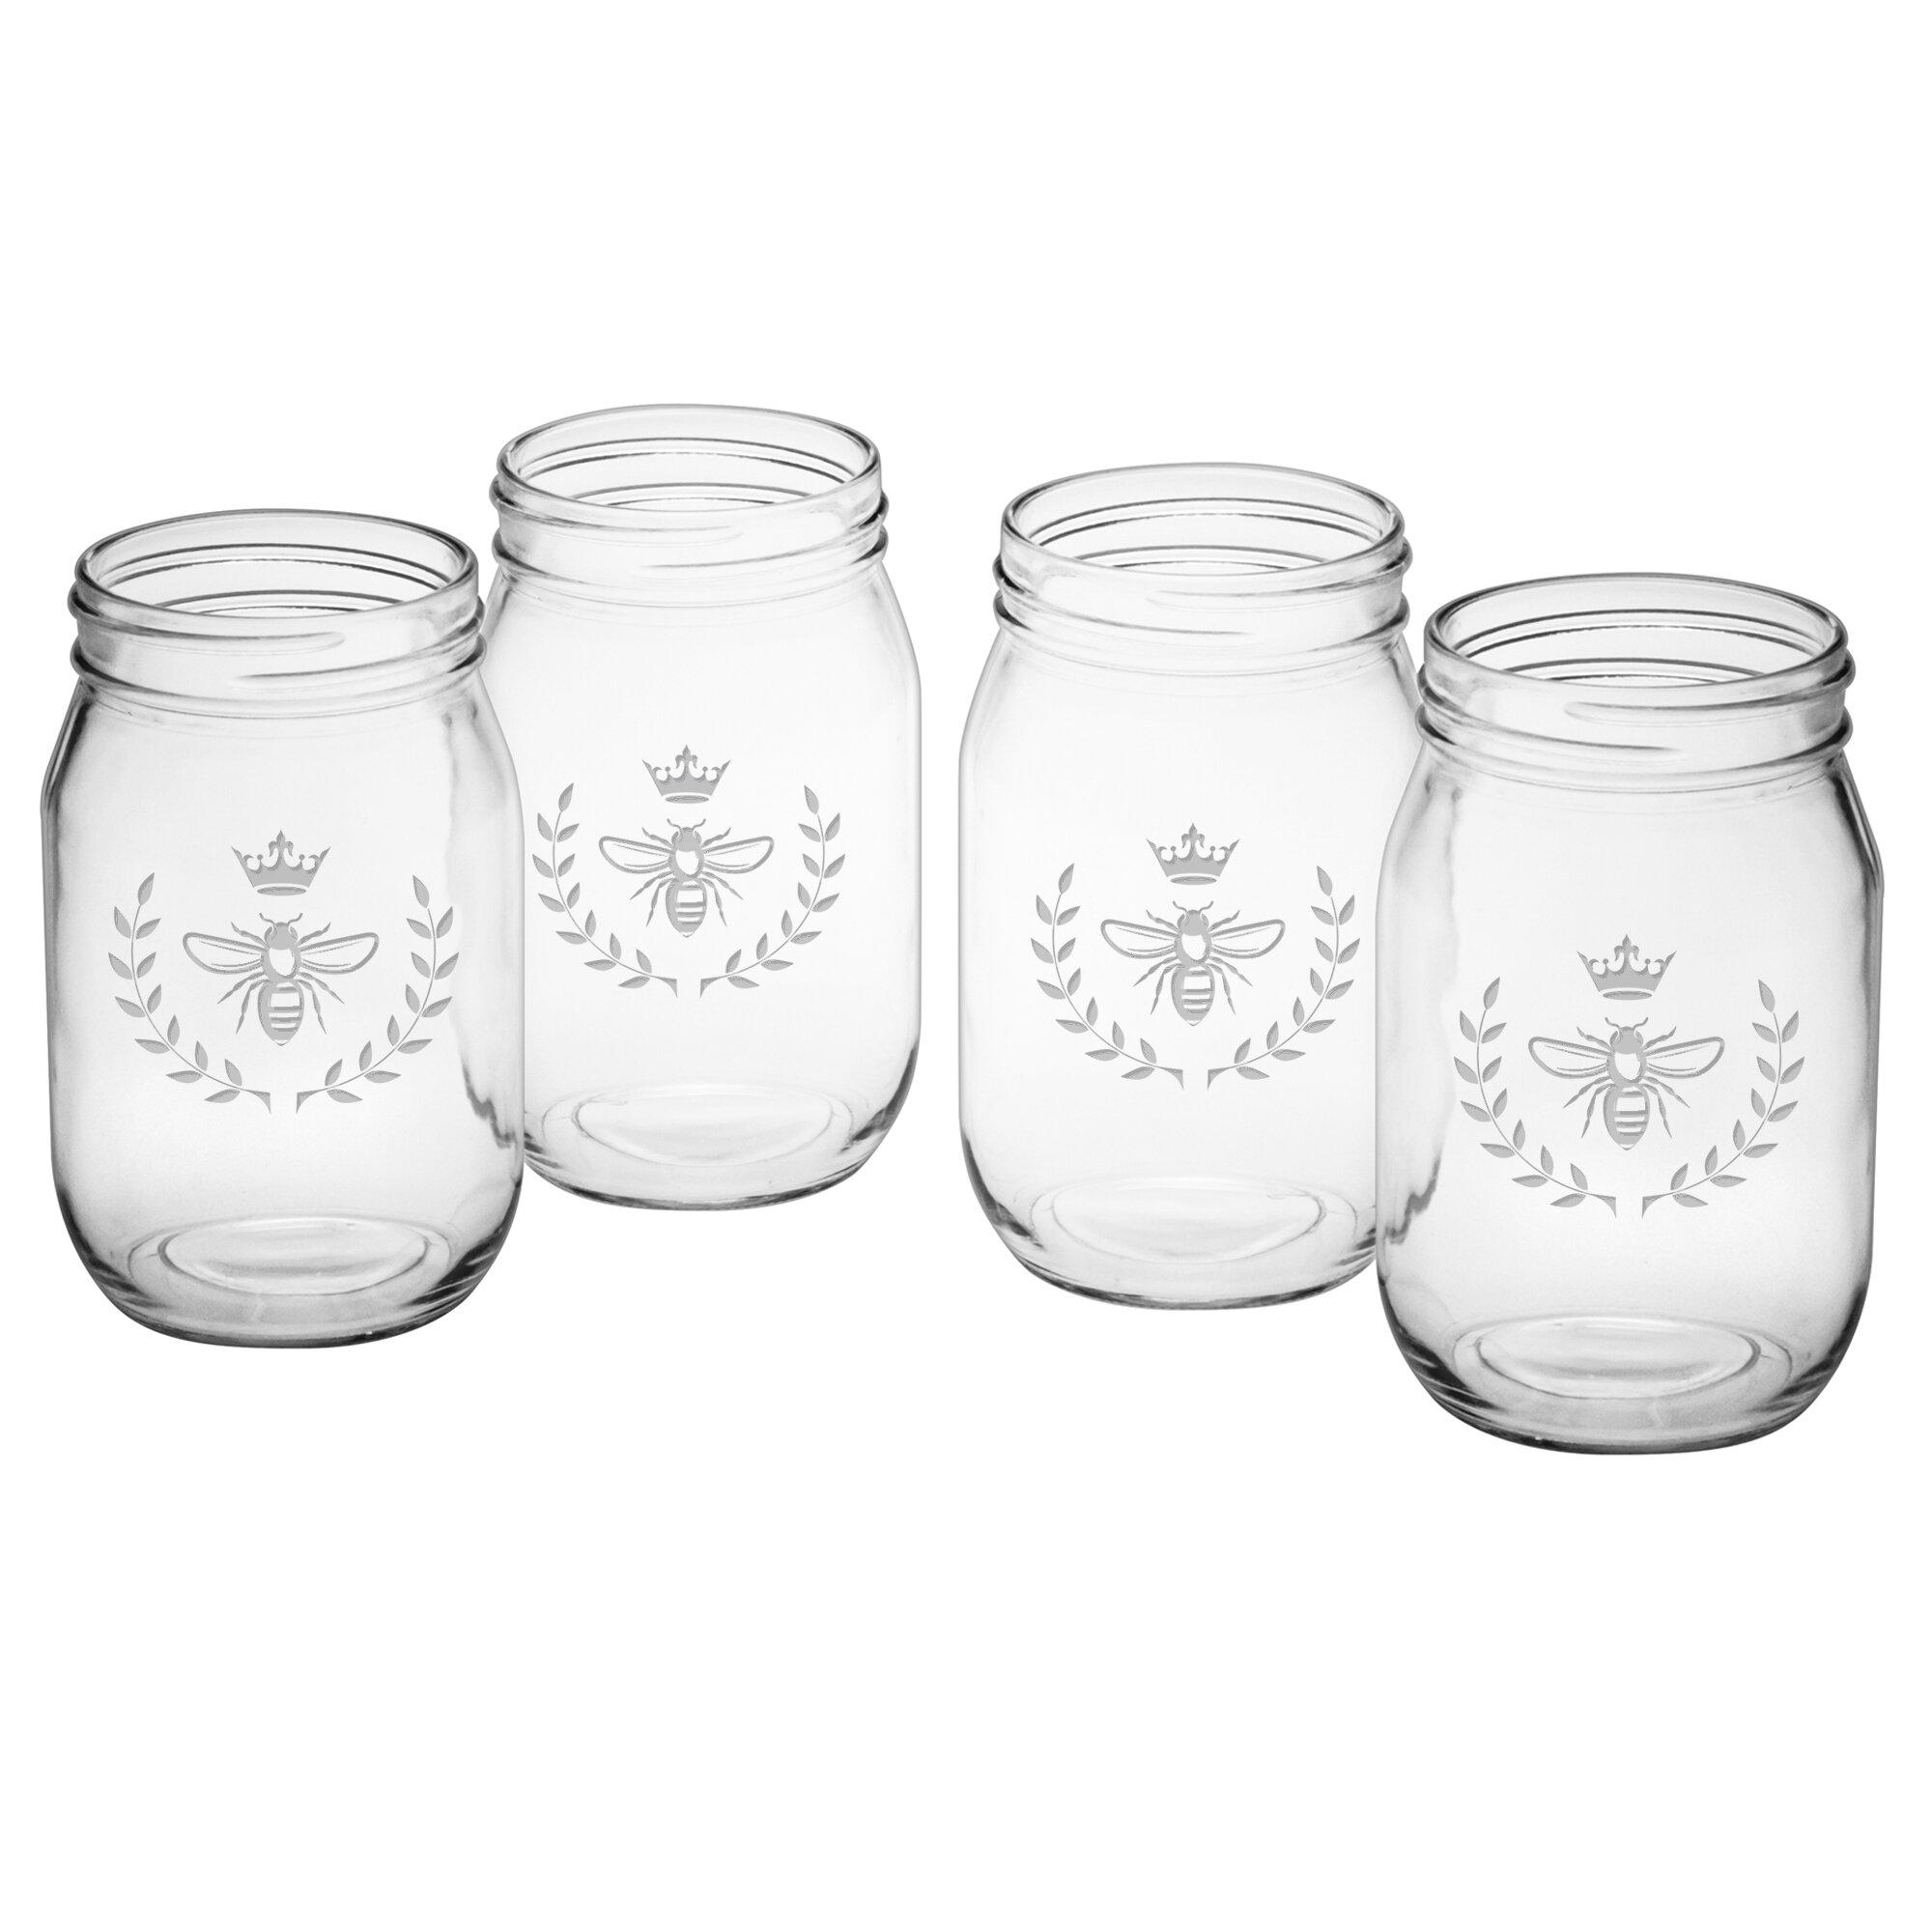 sighild vintage bee 16 oz glass mason jar